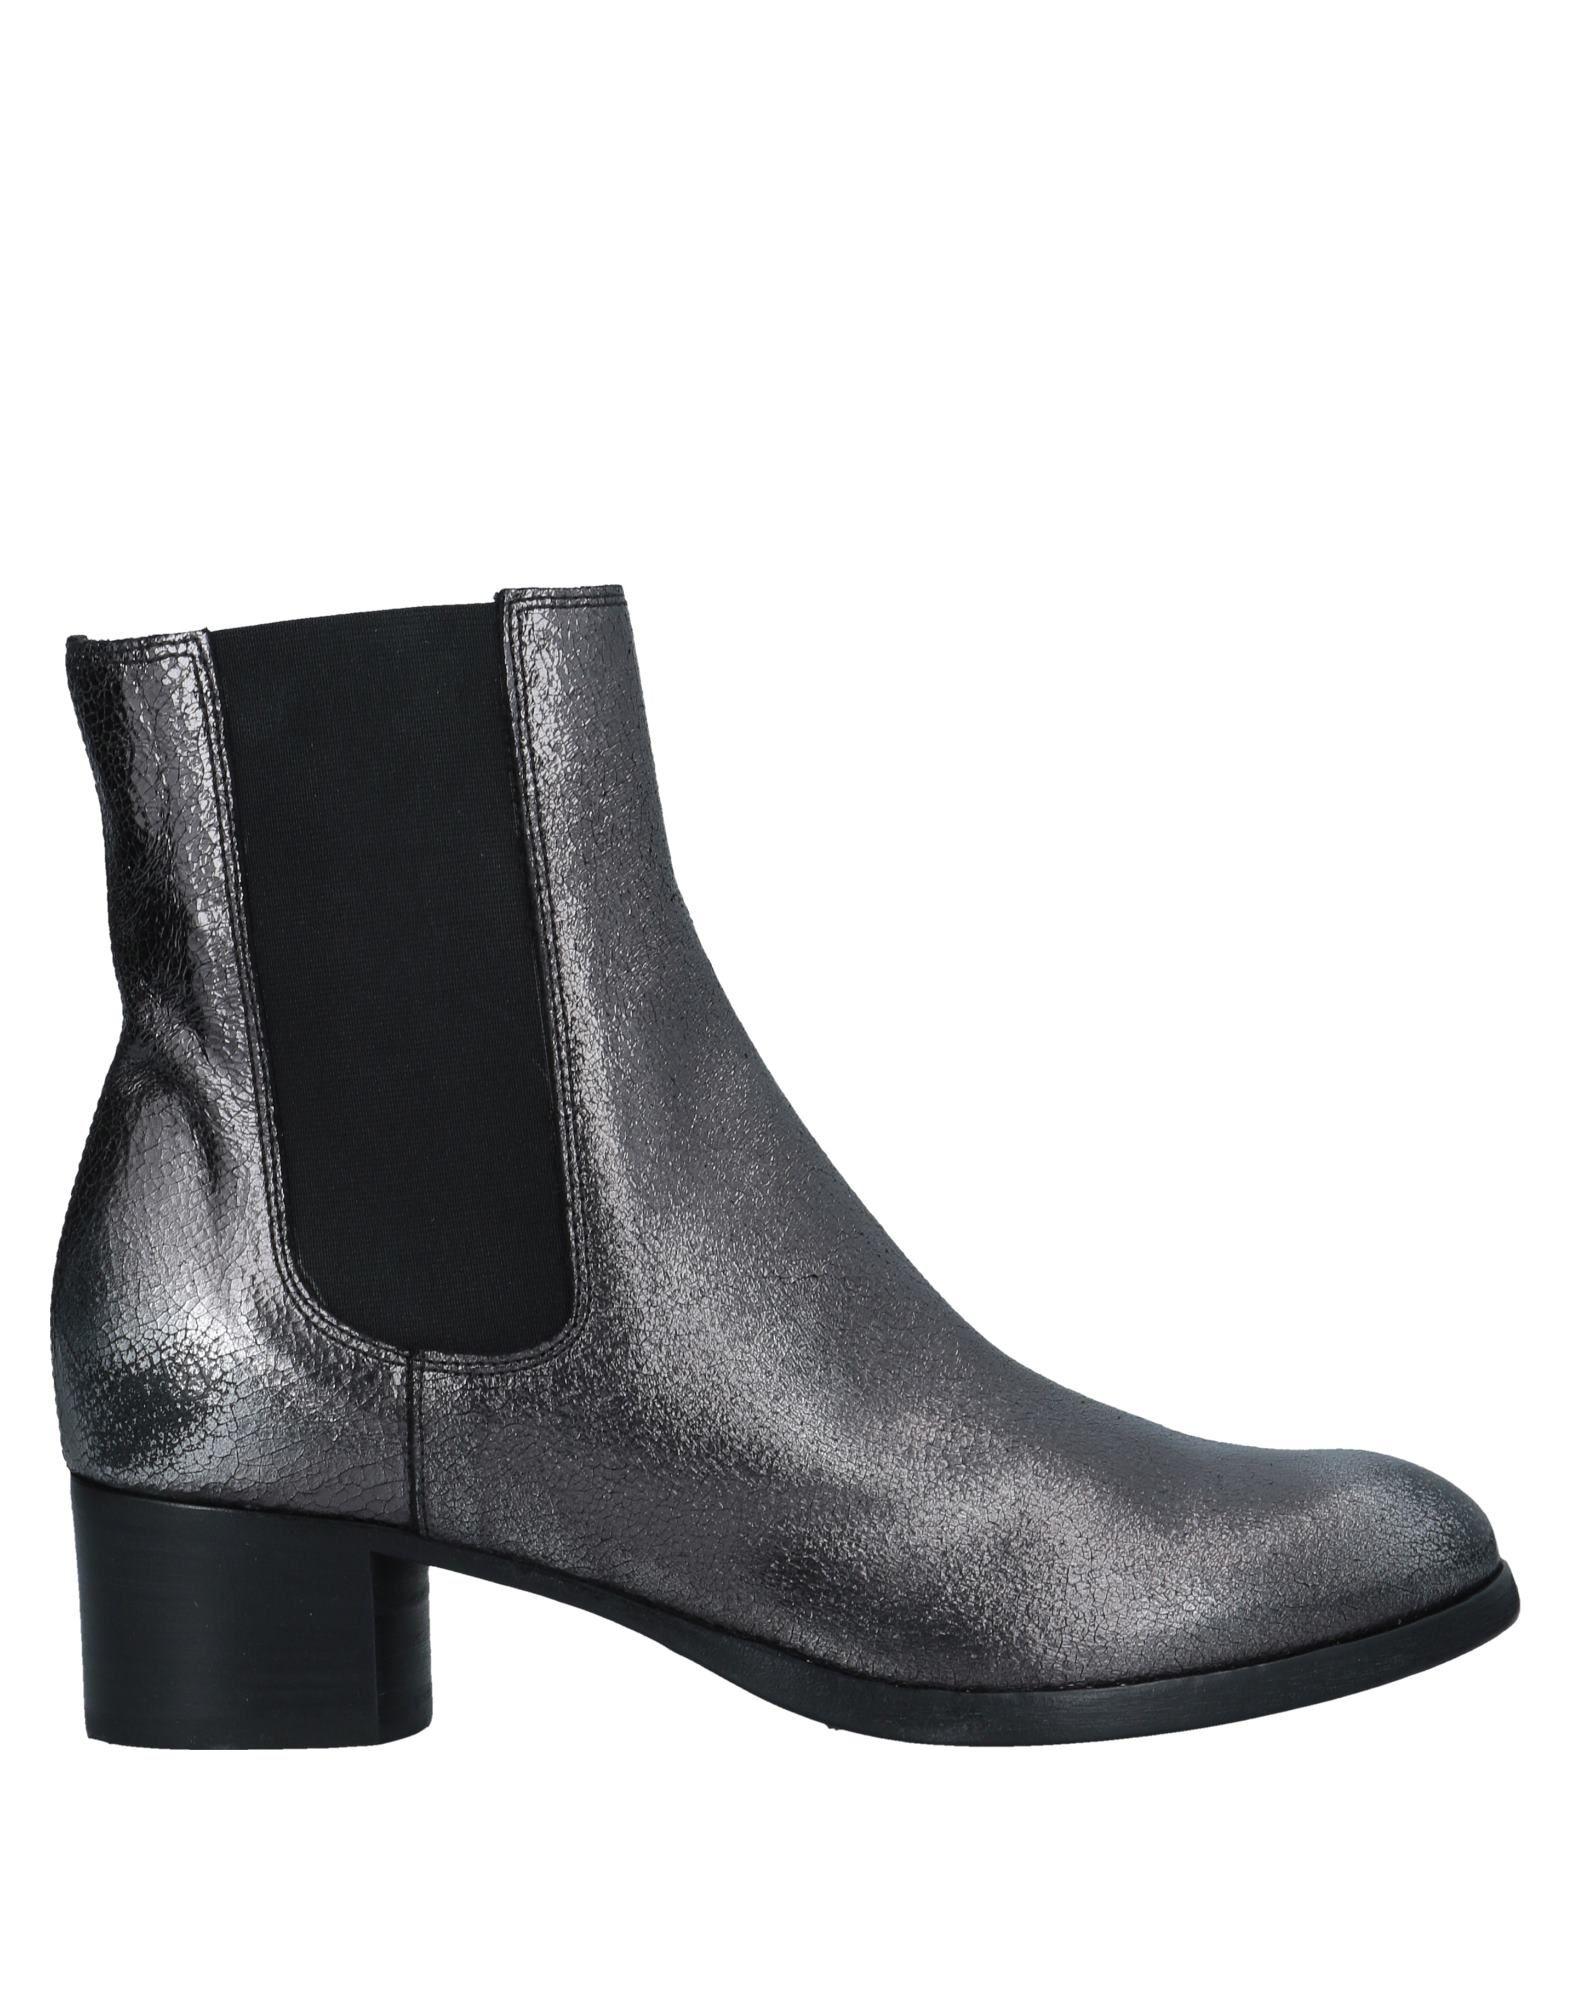 Bottillons Moma Femme - Bottillons Moma Argent Chaussures femme pas cher homme et femme